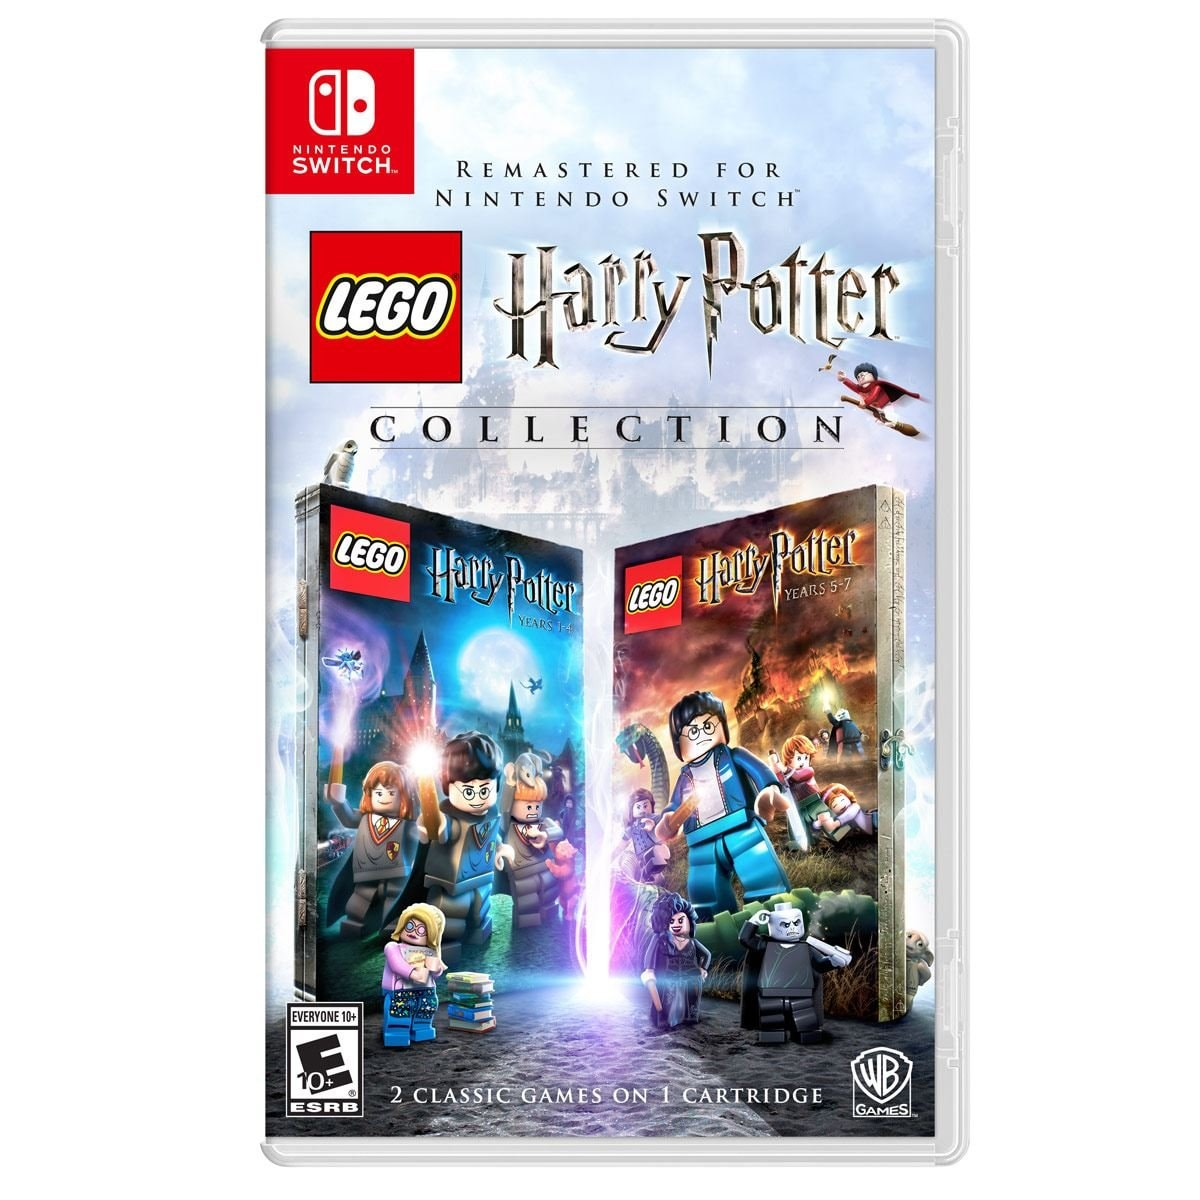 Nintendo Switch Lego Harry Potter